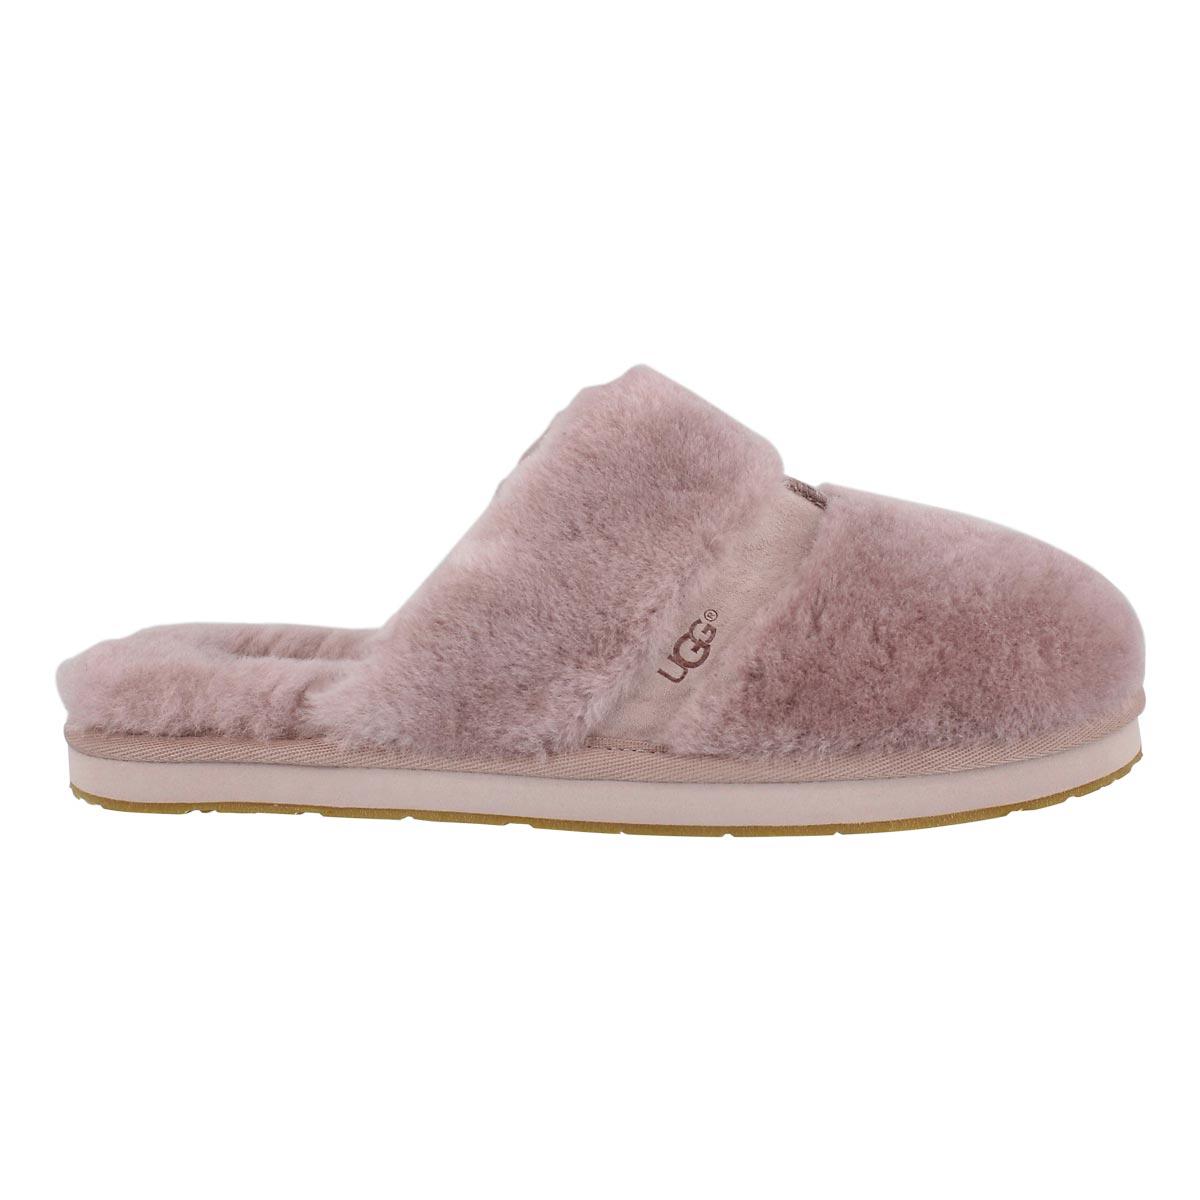 Lds Dalla dusk sheepskin slipper